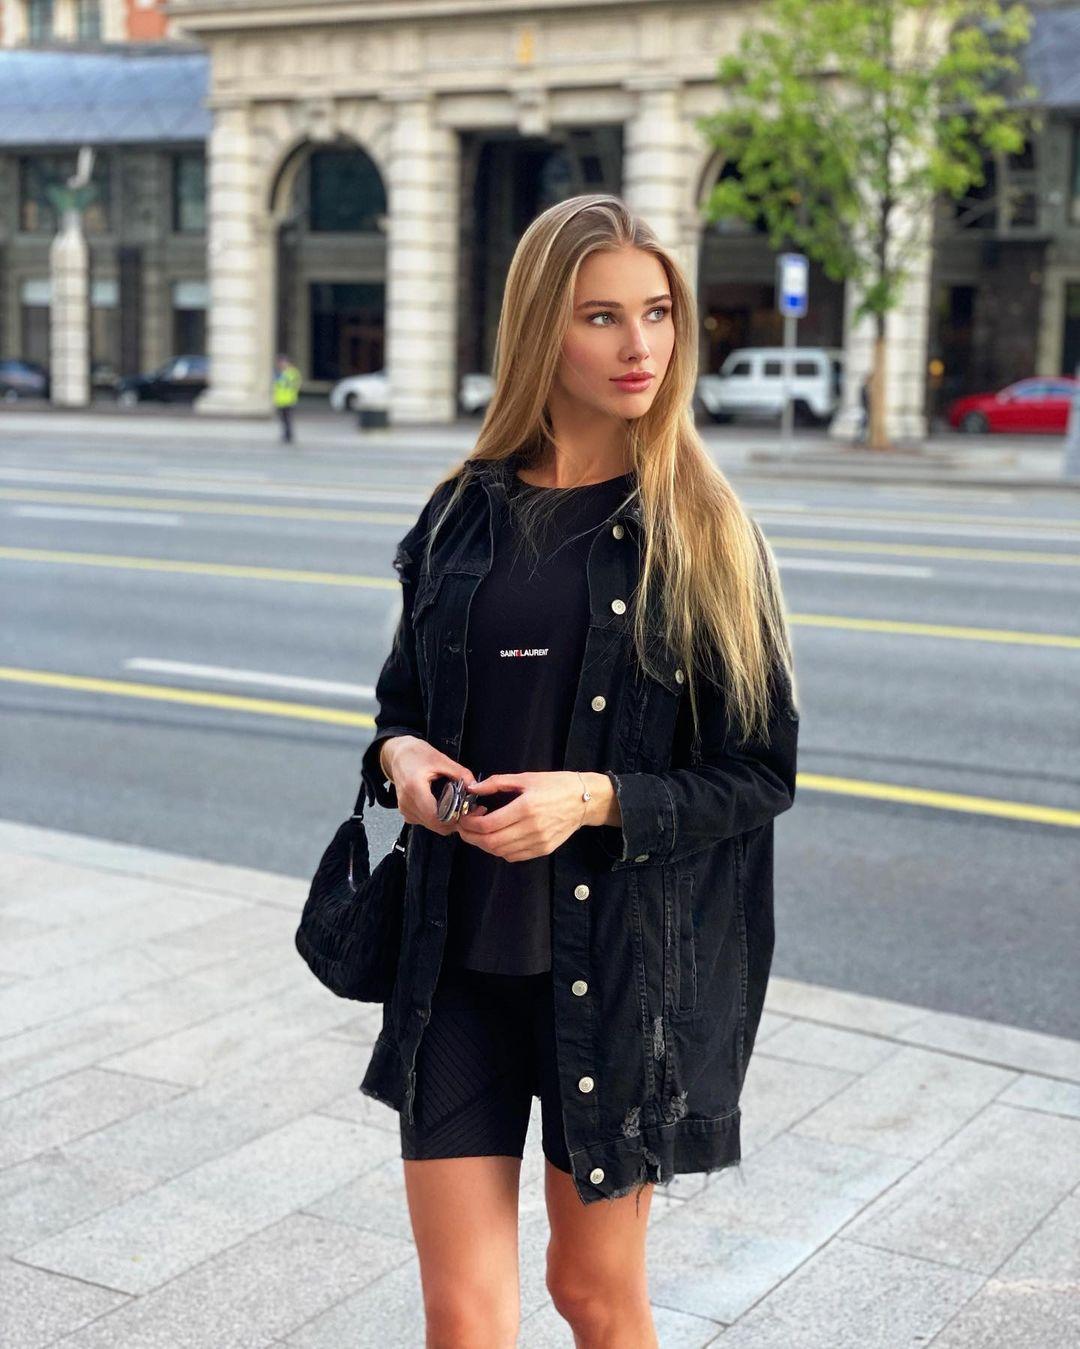 Alena-Kryukova-Wallpapers-Insta-Biography-4